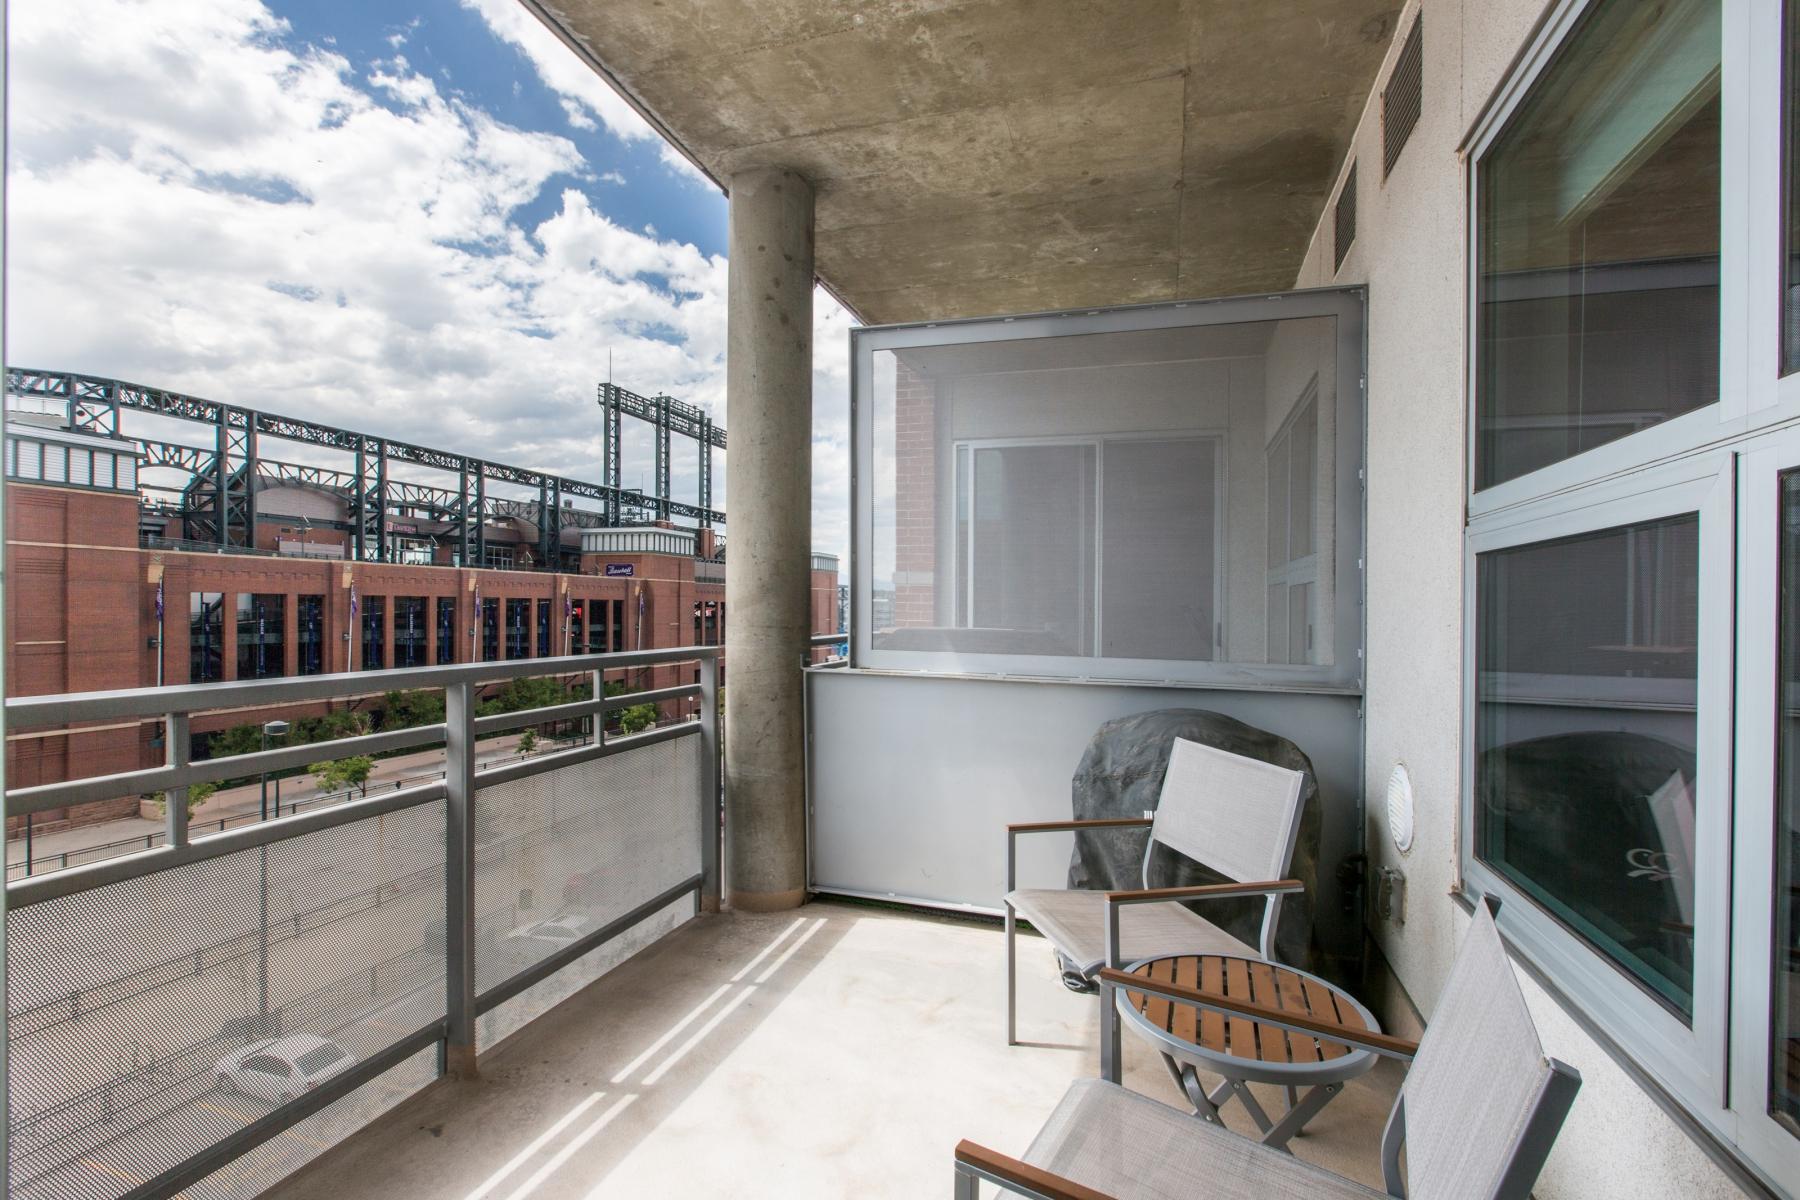 Condominium for Sale at Extraordinary 5th floor home in Zi Lofts 2229 Blake St #505 Denver, Colorado 80205 United States